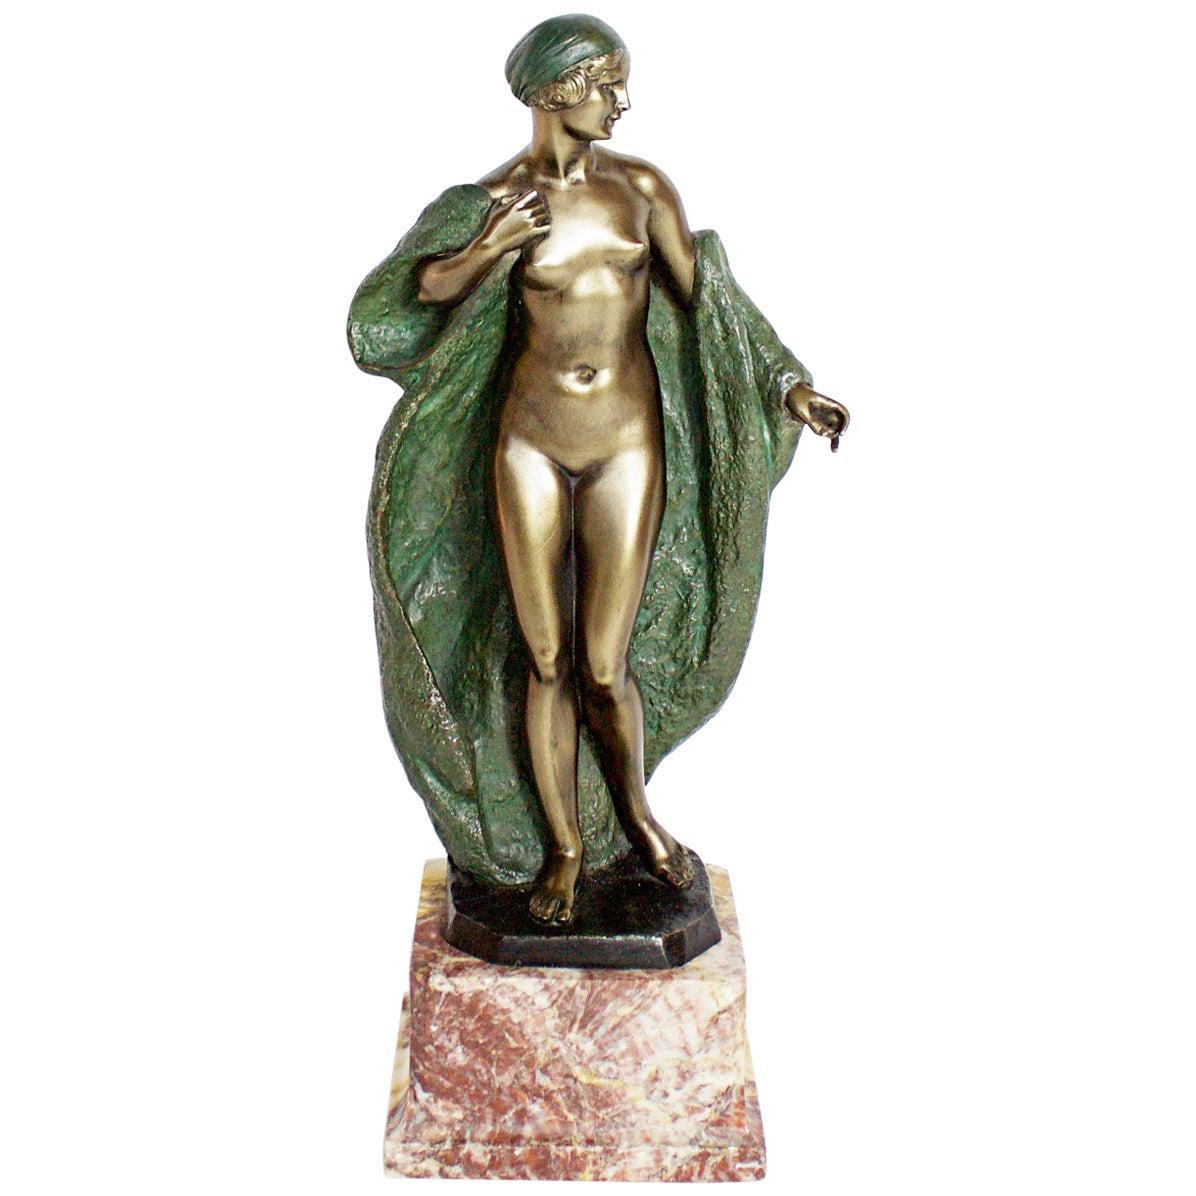 Art Deco Bronze Sculpture by Joé Descomps, French, circa 1925